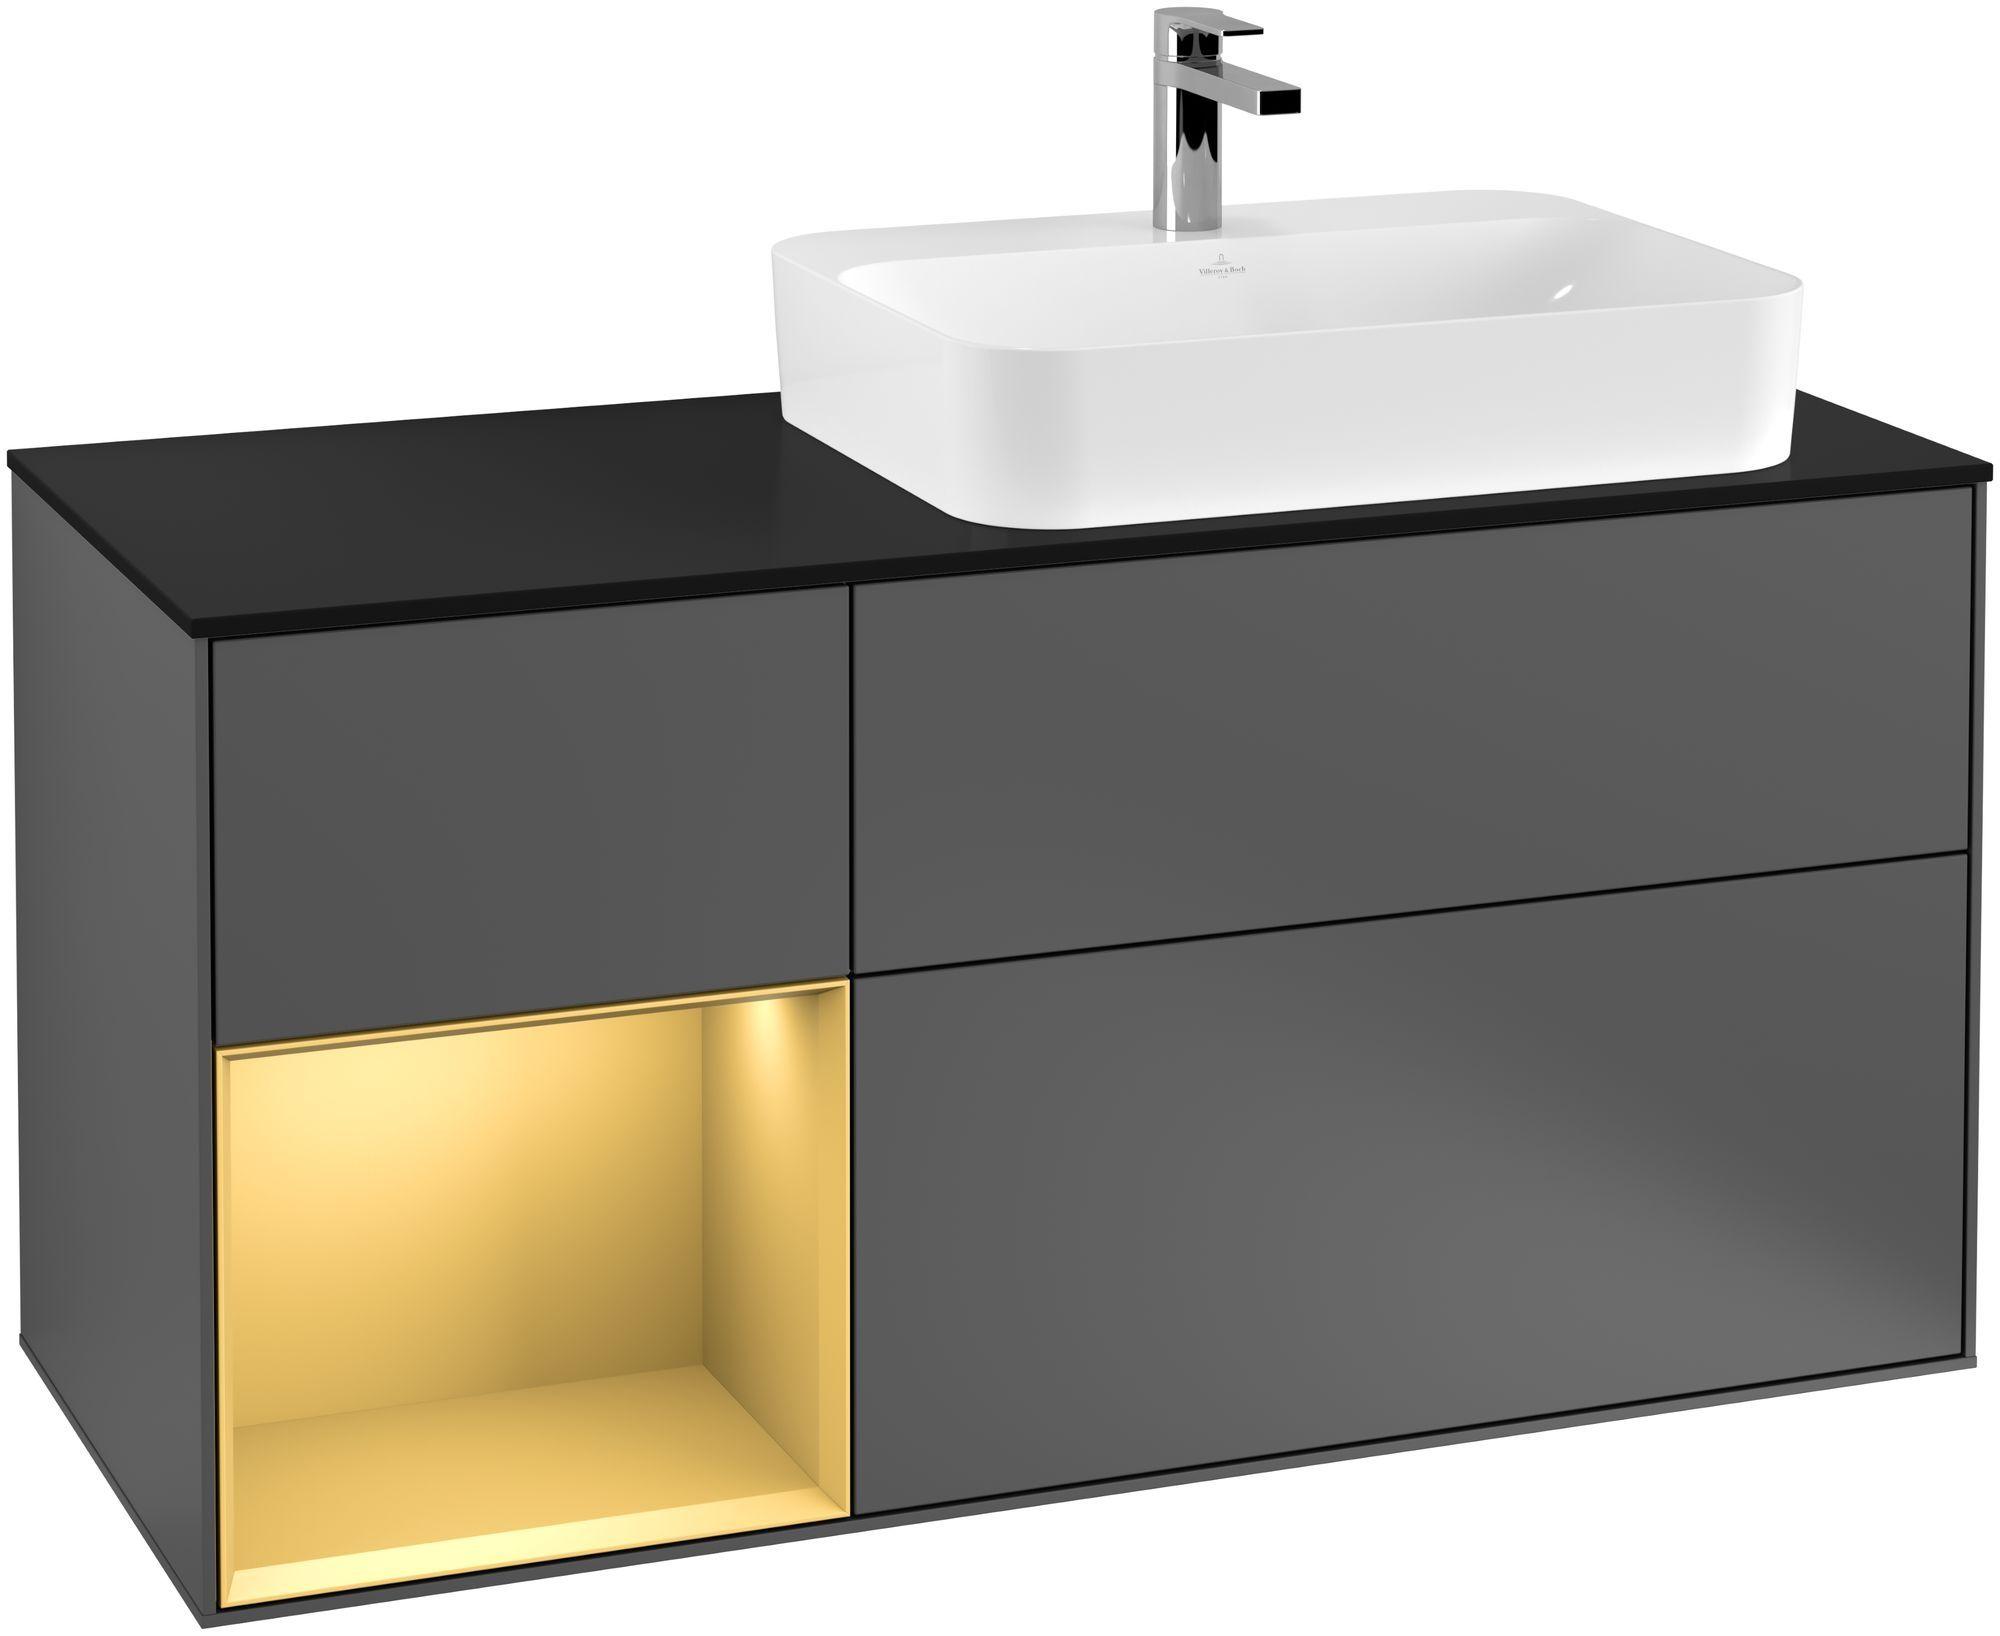 Villeroy & Boch Finion F39 Waschtischunterschrank mit Regalelement 3 Auszüge Waschtisch rechts LED-Beleuchtung B:120xH:60,3xT:50,1cm Front, Korpus: Anthracite Matt, Regal: Gold Matt, Glasplatte: Black Matt F392HFGK